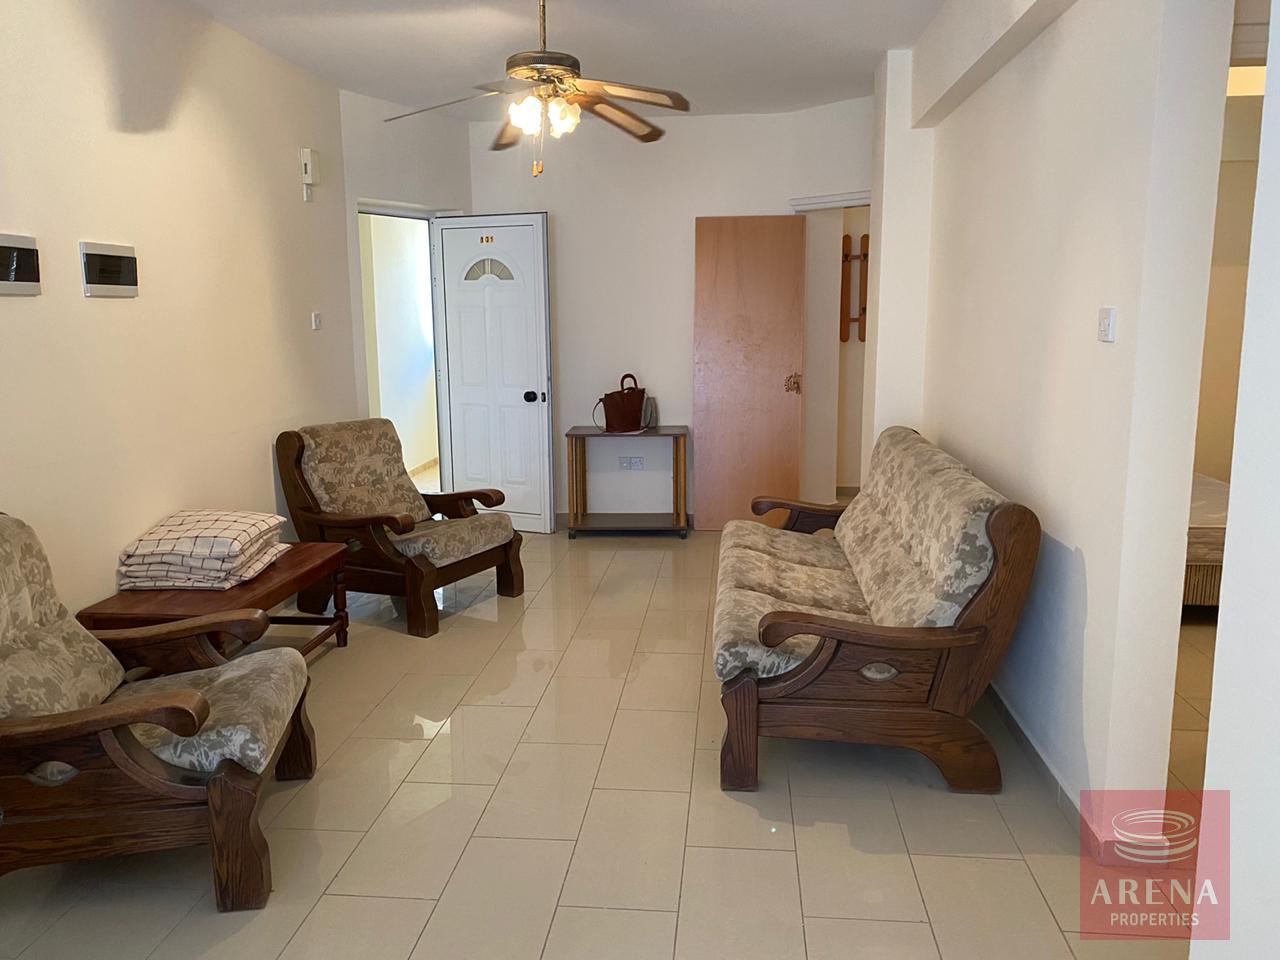 2 bedroom apartment in kapparis - living-area